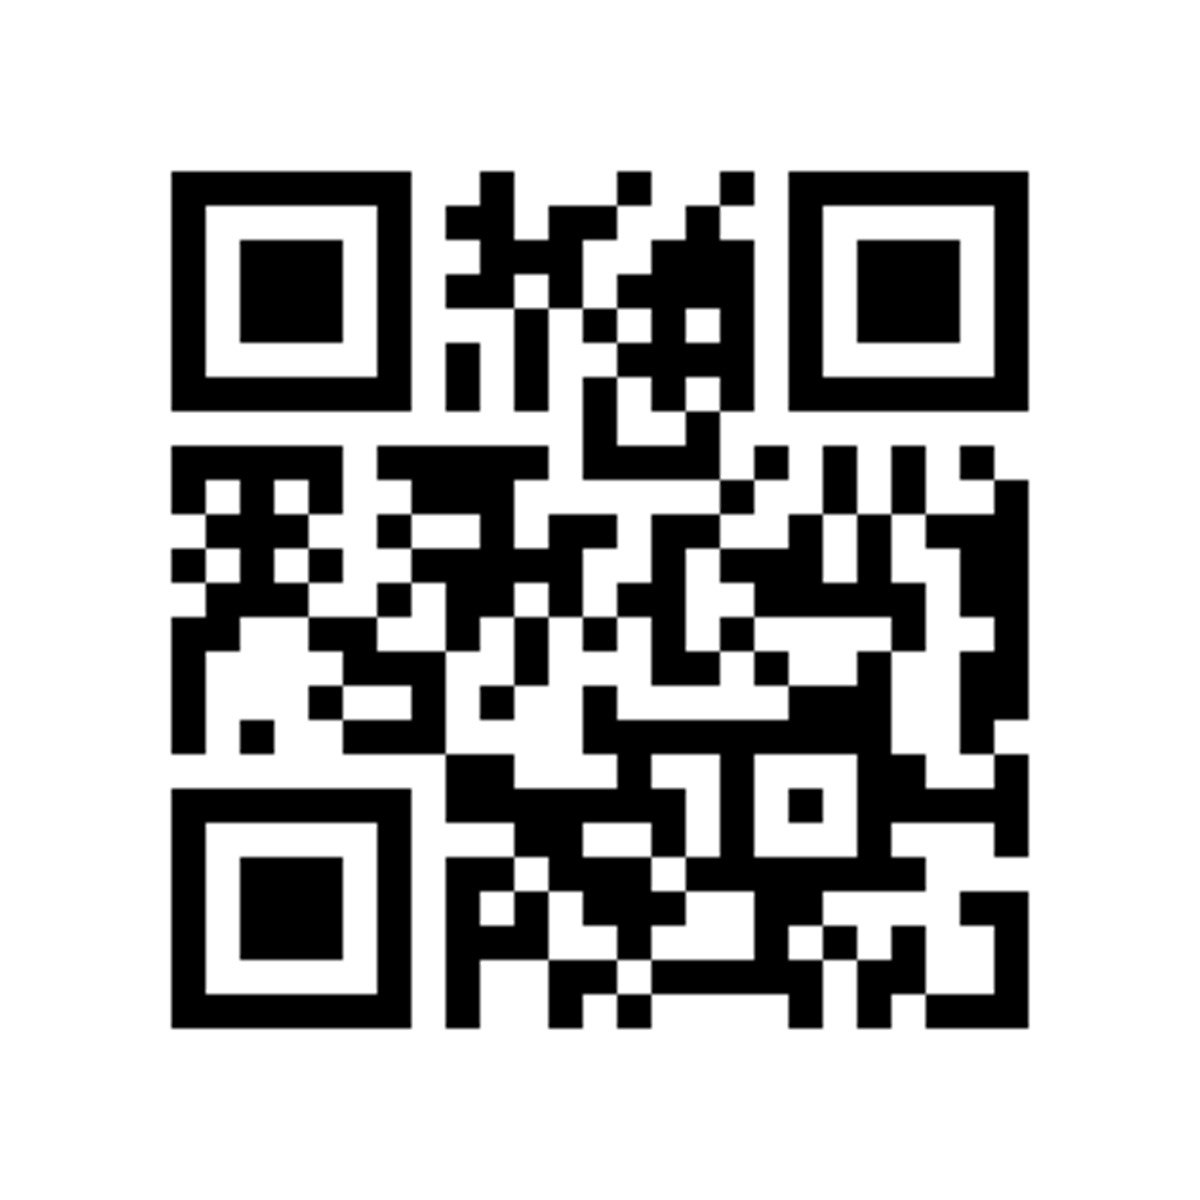 ZXing Project QR Code Generator Alternatives and Similar